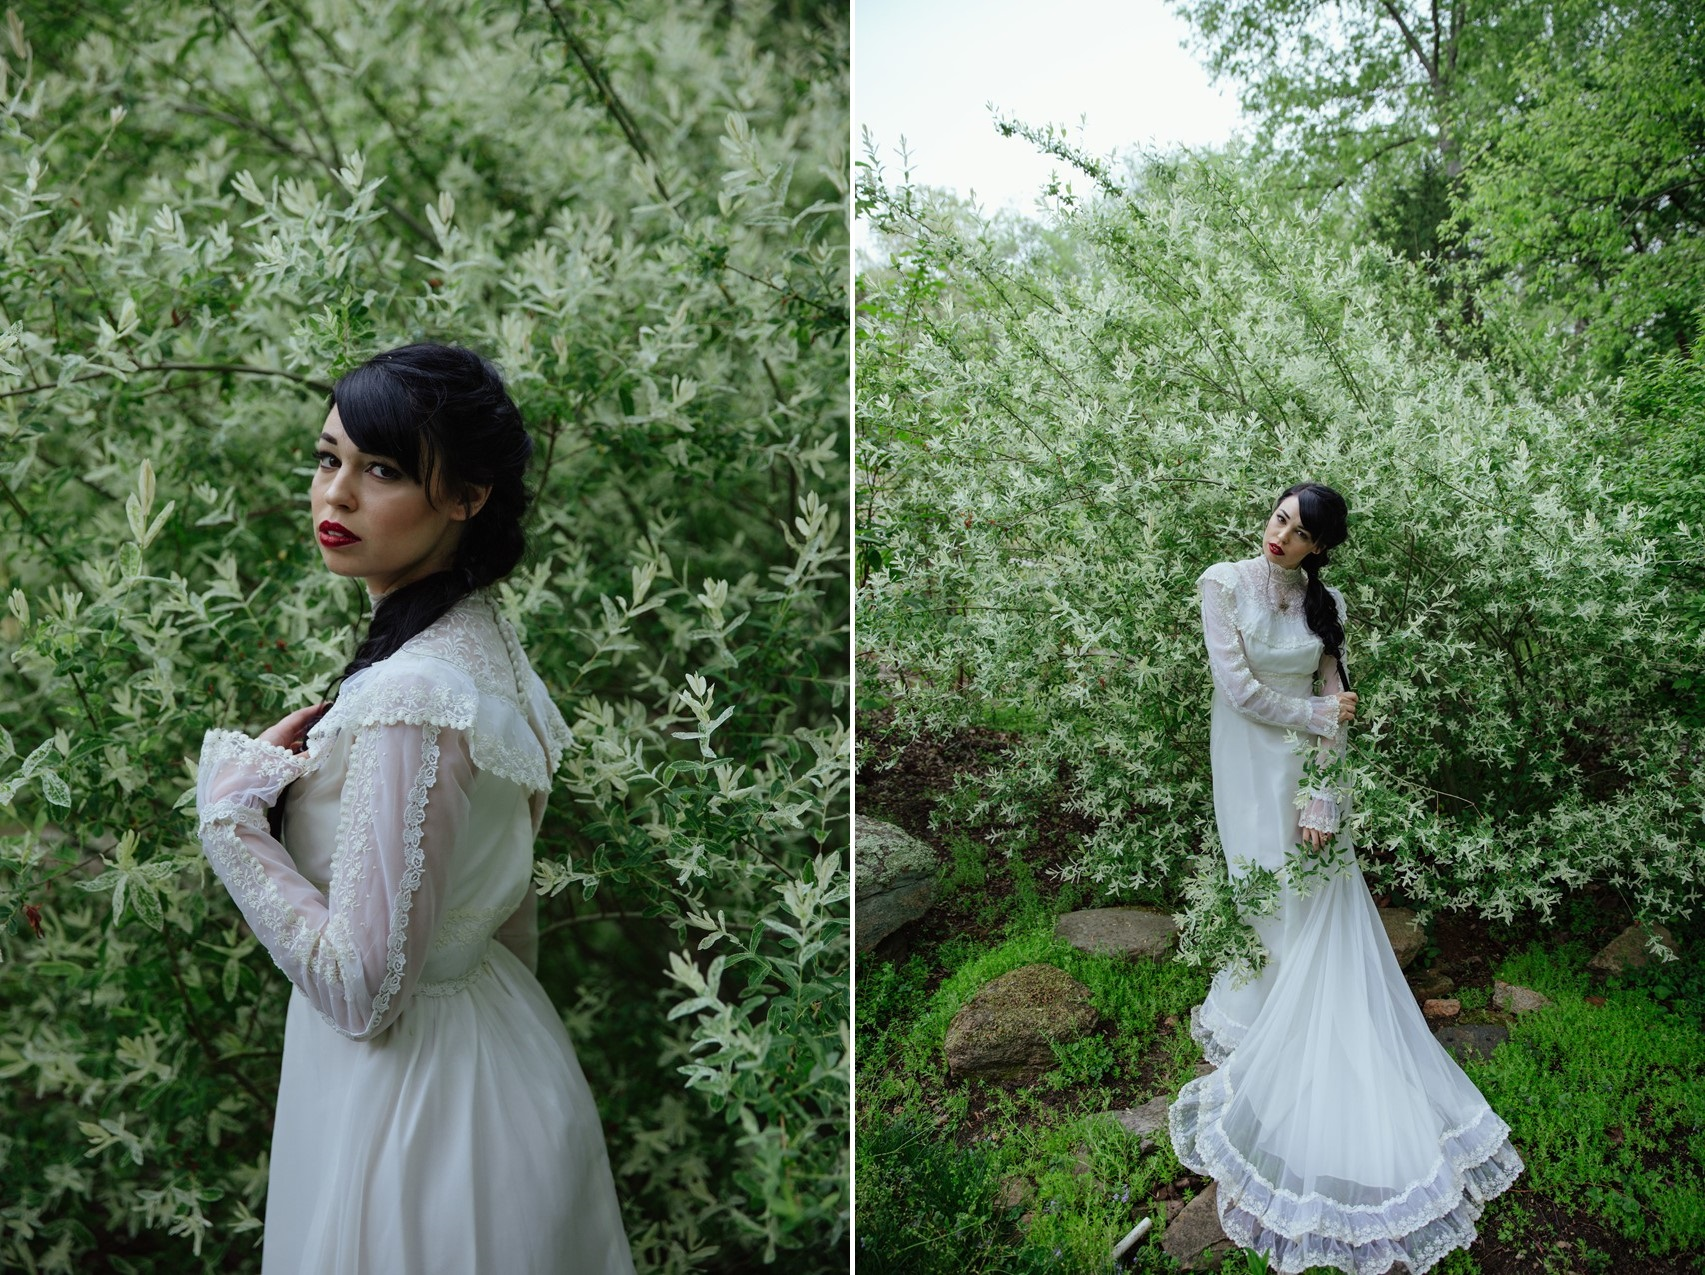 6-Edwardian-Vintage-Wedding-Dress